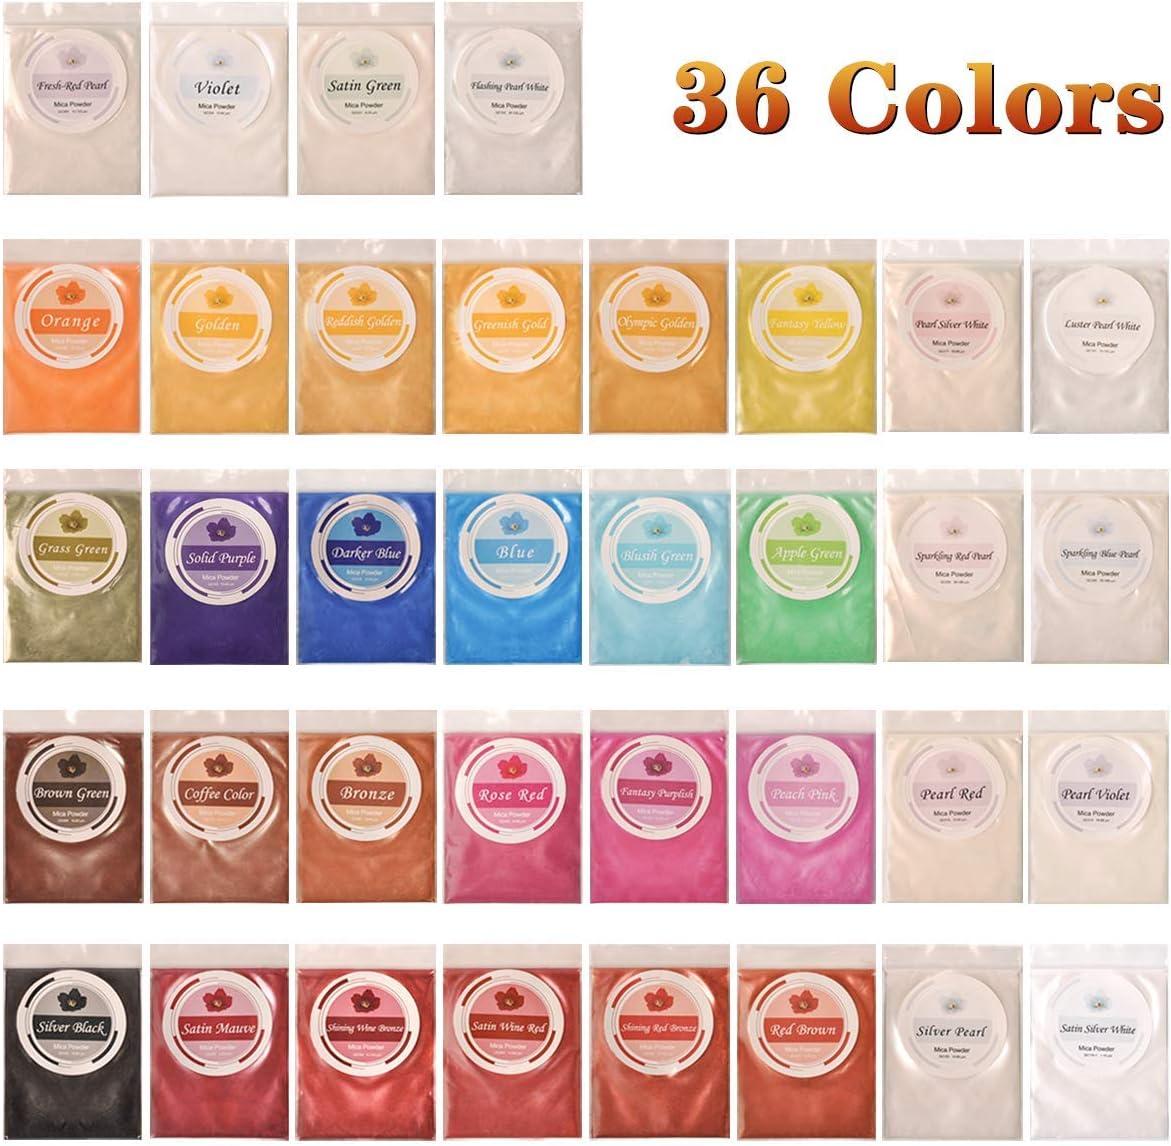 Seifenfarbe Set Mica Pulver Pigmentpulver Farbpigmente f/ür Epoxidharz Epoxy Resin Harz Metallic Farben Pigment DEWEL Epoxidharz Farbe ca.36 * 5g